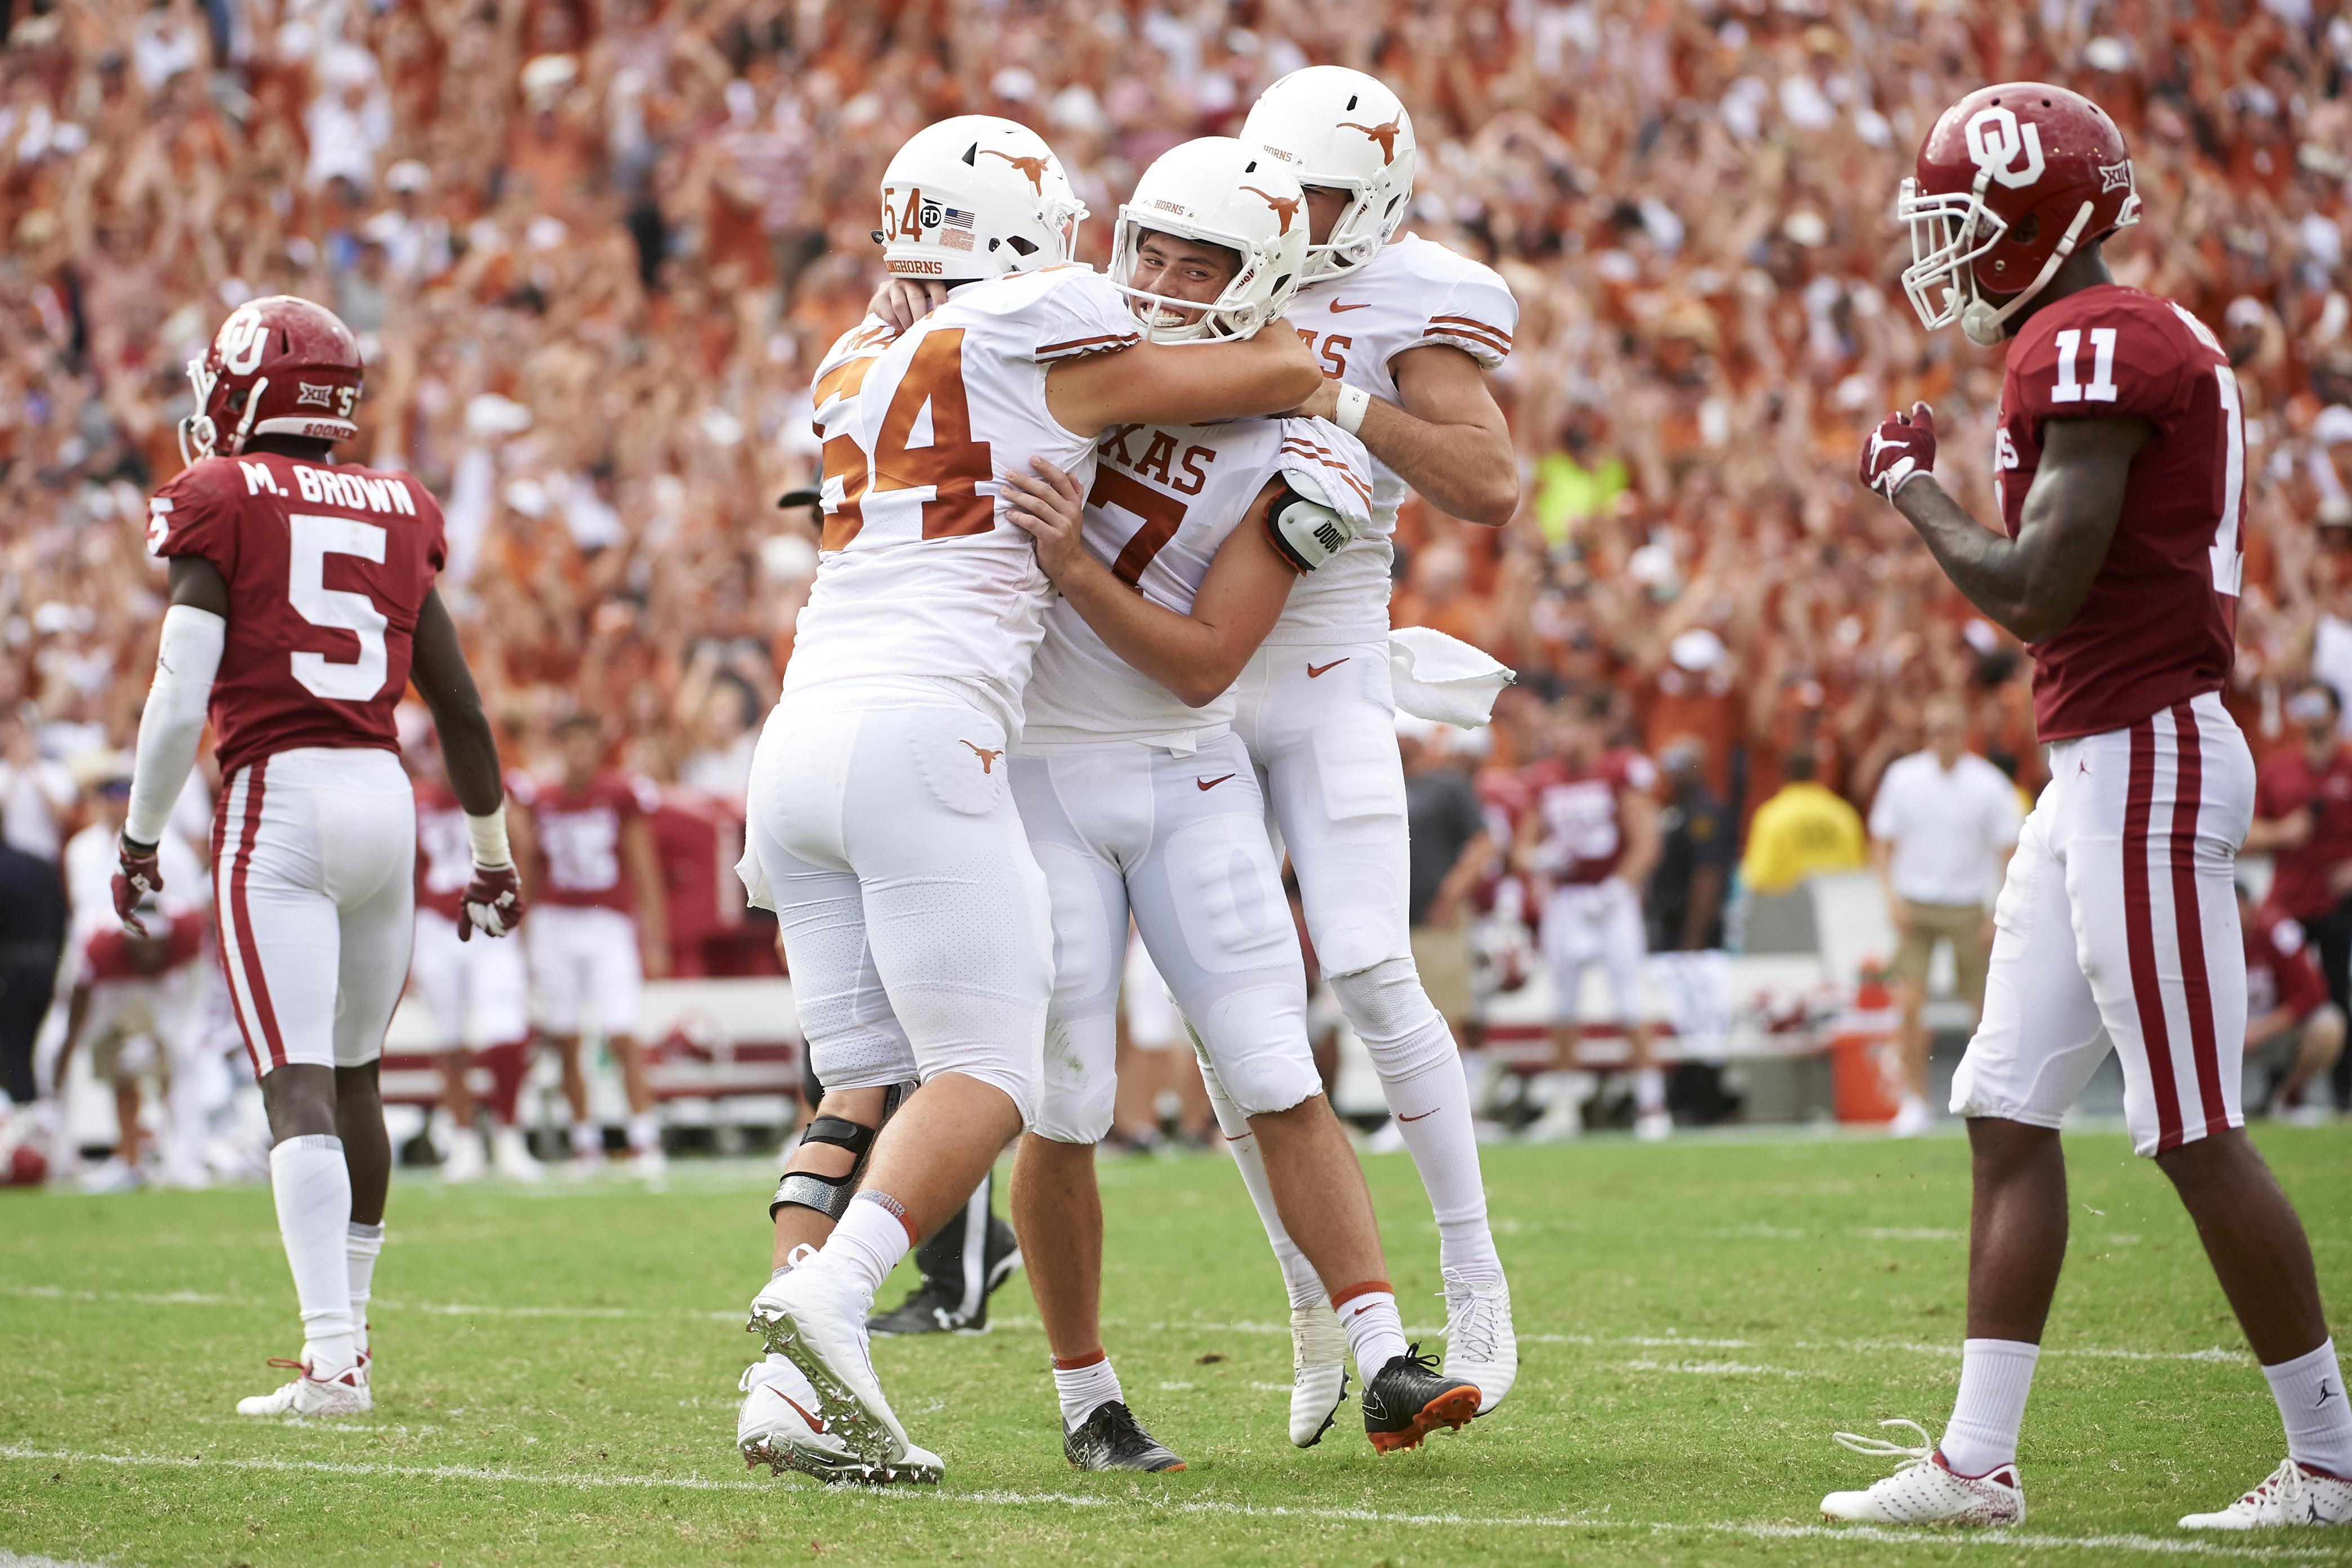 Top 25 roundup: No  19 Texas beats No  7 Oklahoma 48-45 on